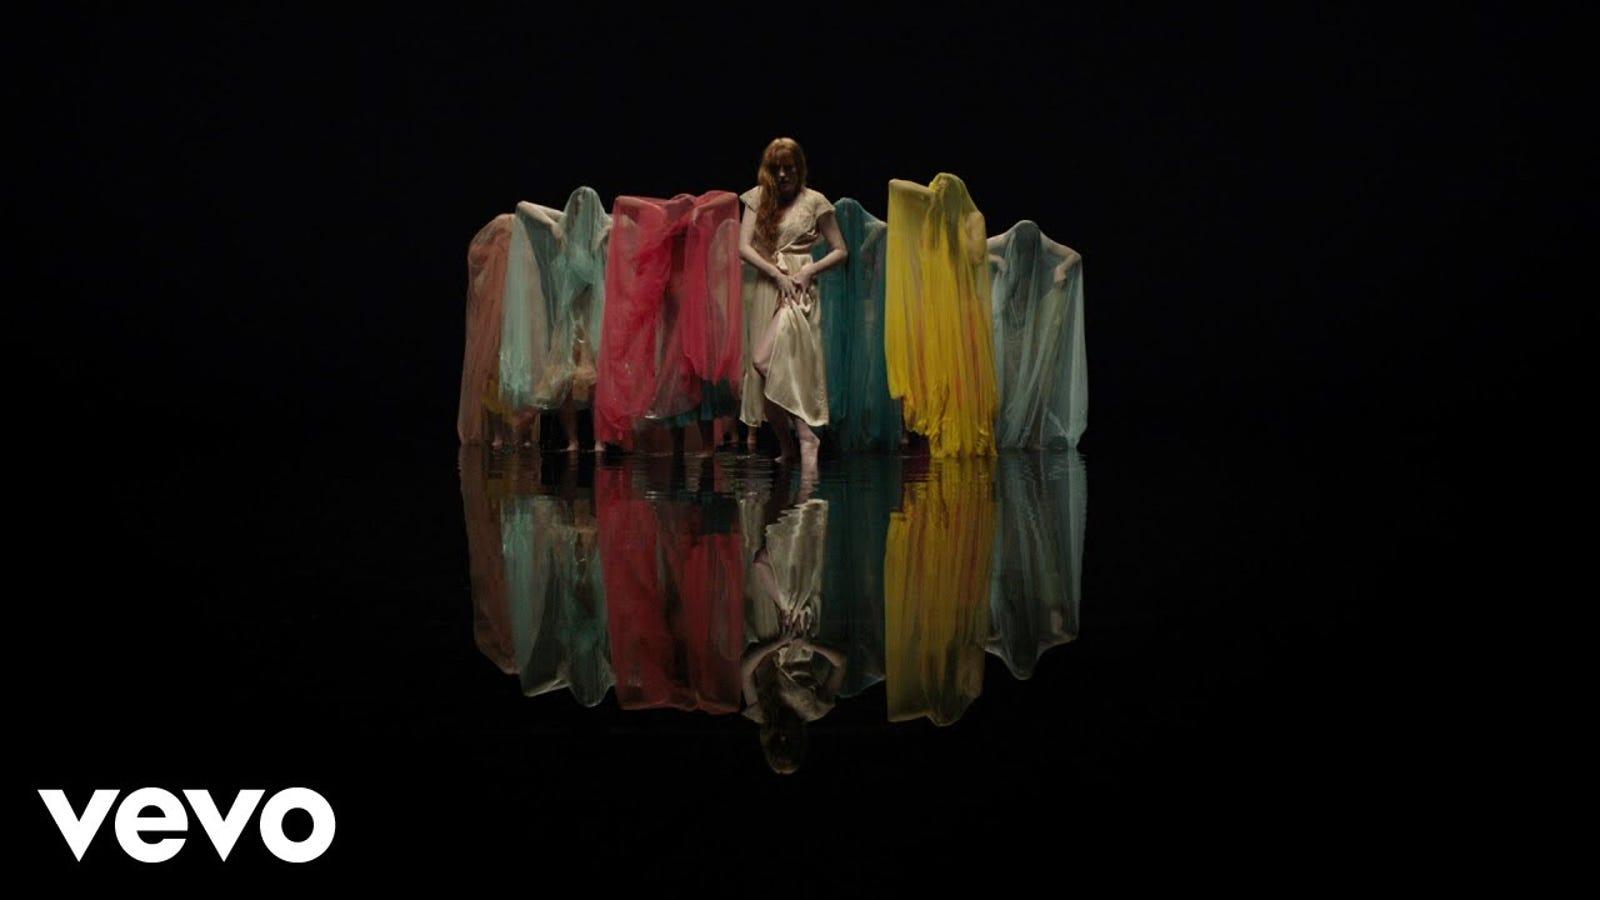 Florence and the Machine's 'Big God' Is a Big Mood